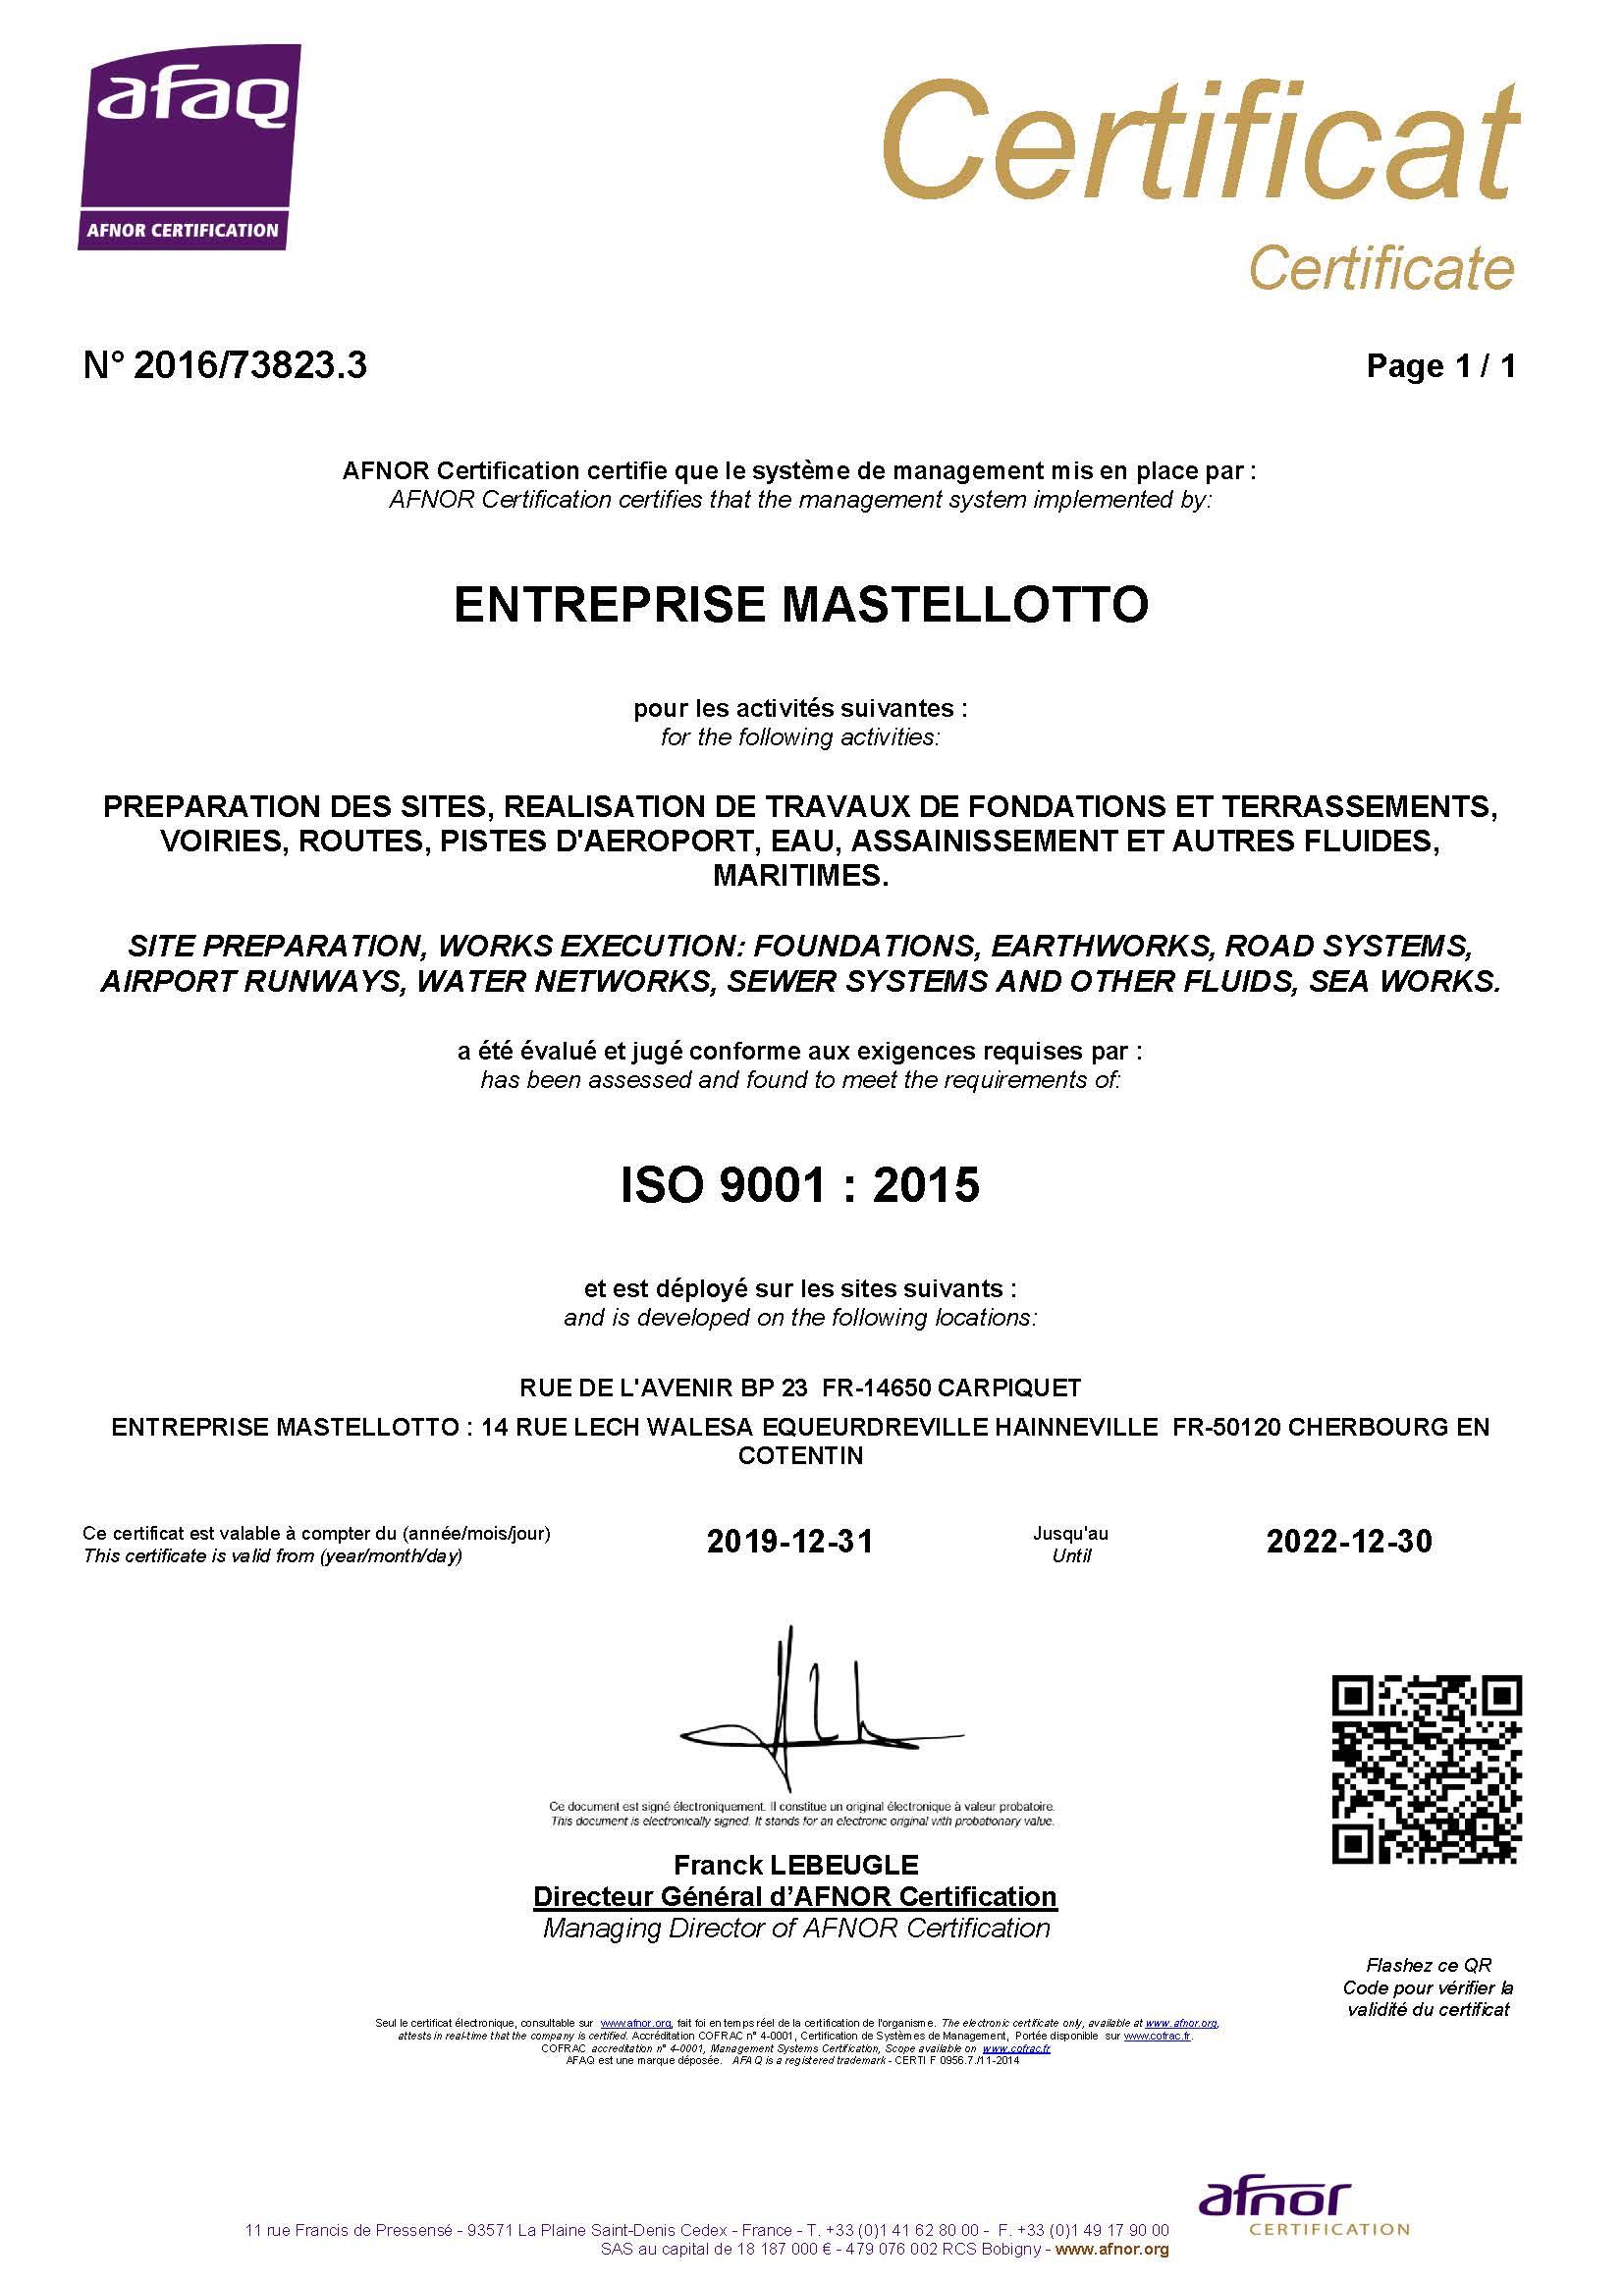 Preview Certificat ISO 9001 2020-2022